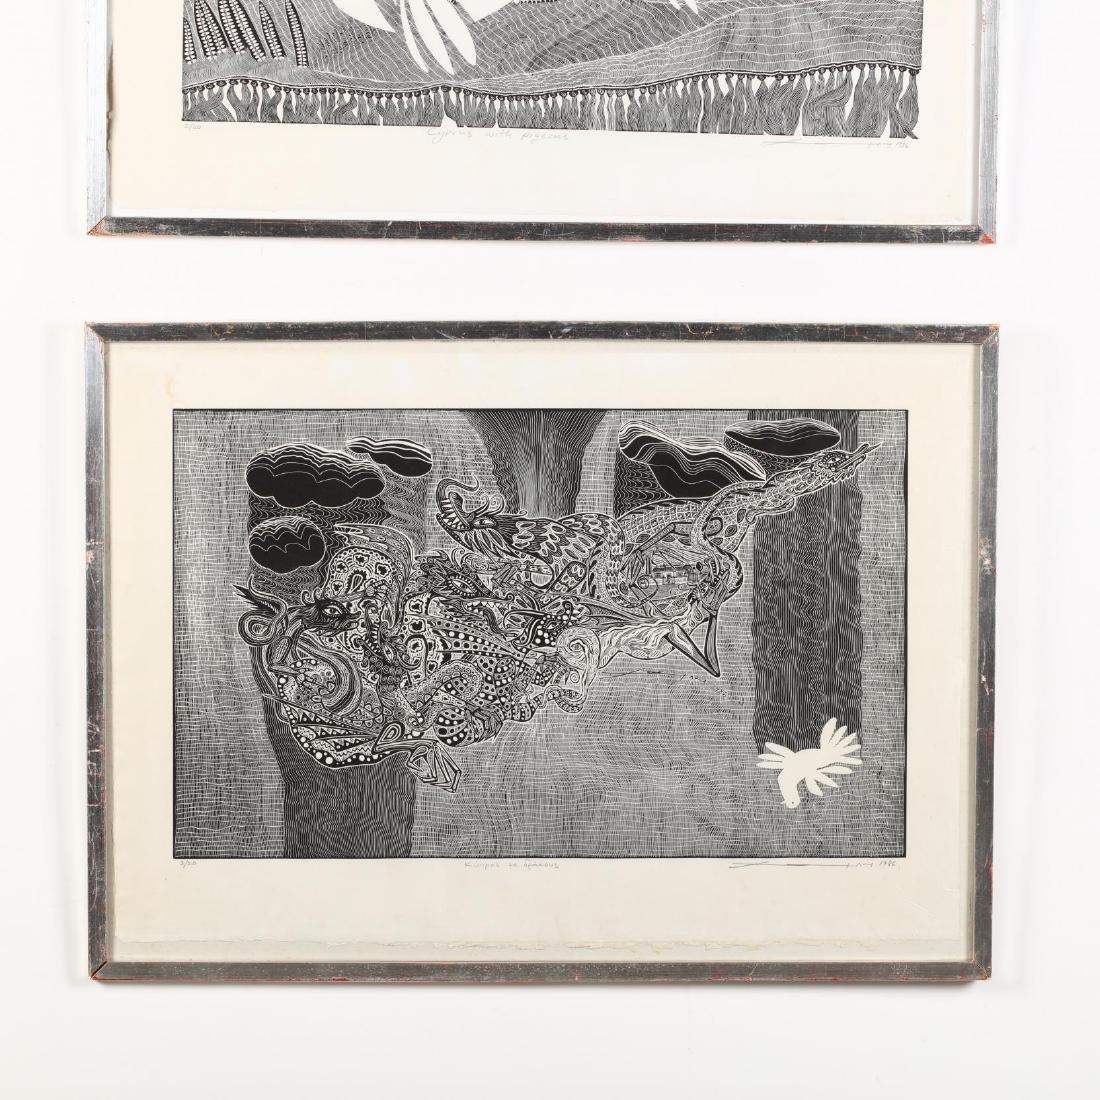 Hambis Tsangaris (Cypriot, b. 1947), Two Visions of - 5